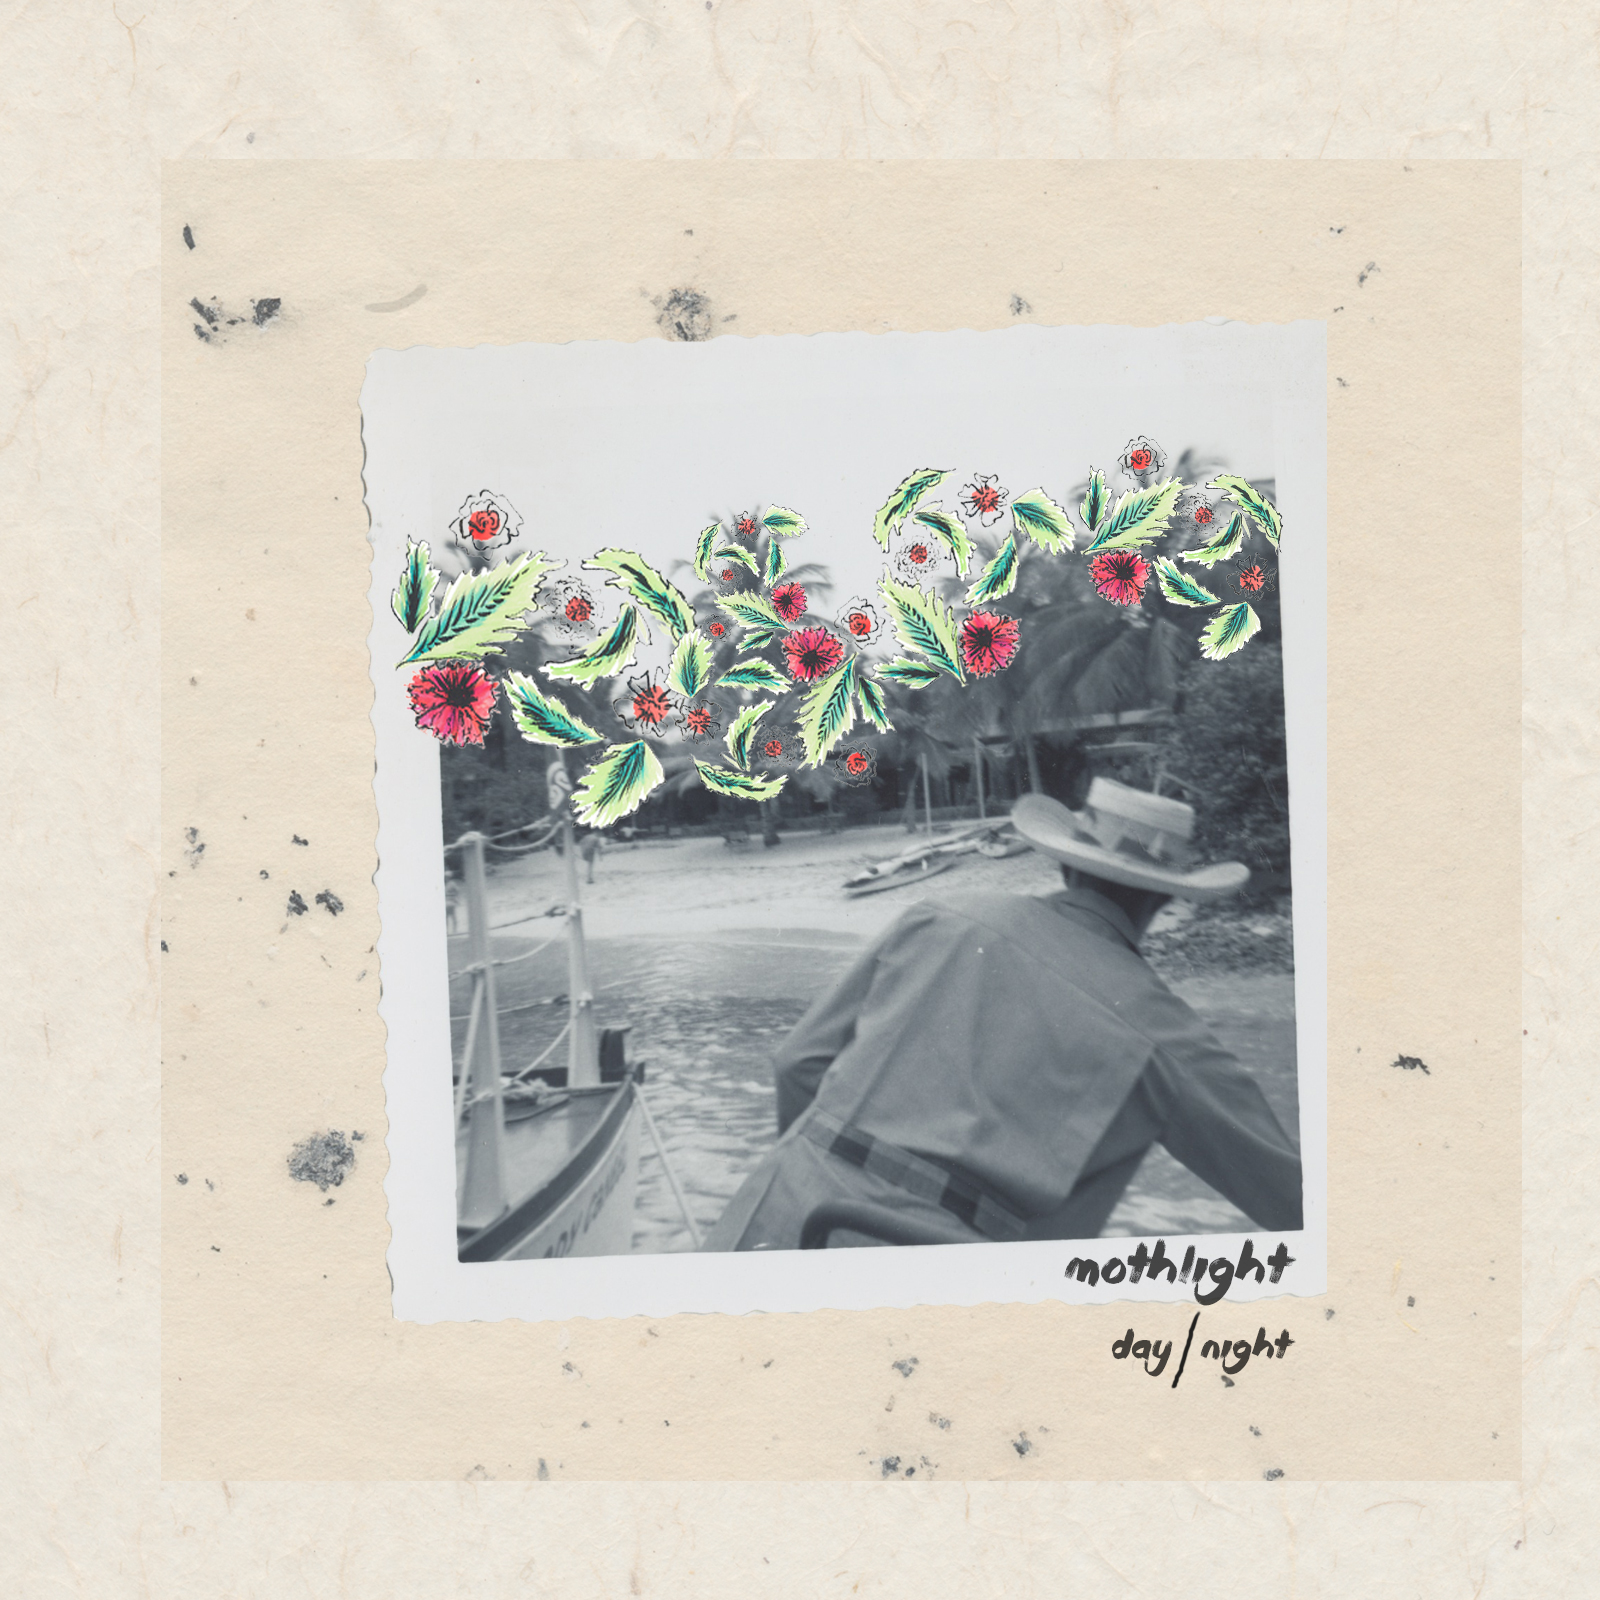 Mothlight premiere aching new single Day/Night    listen